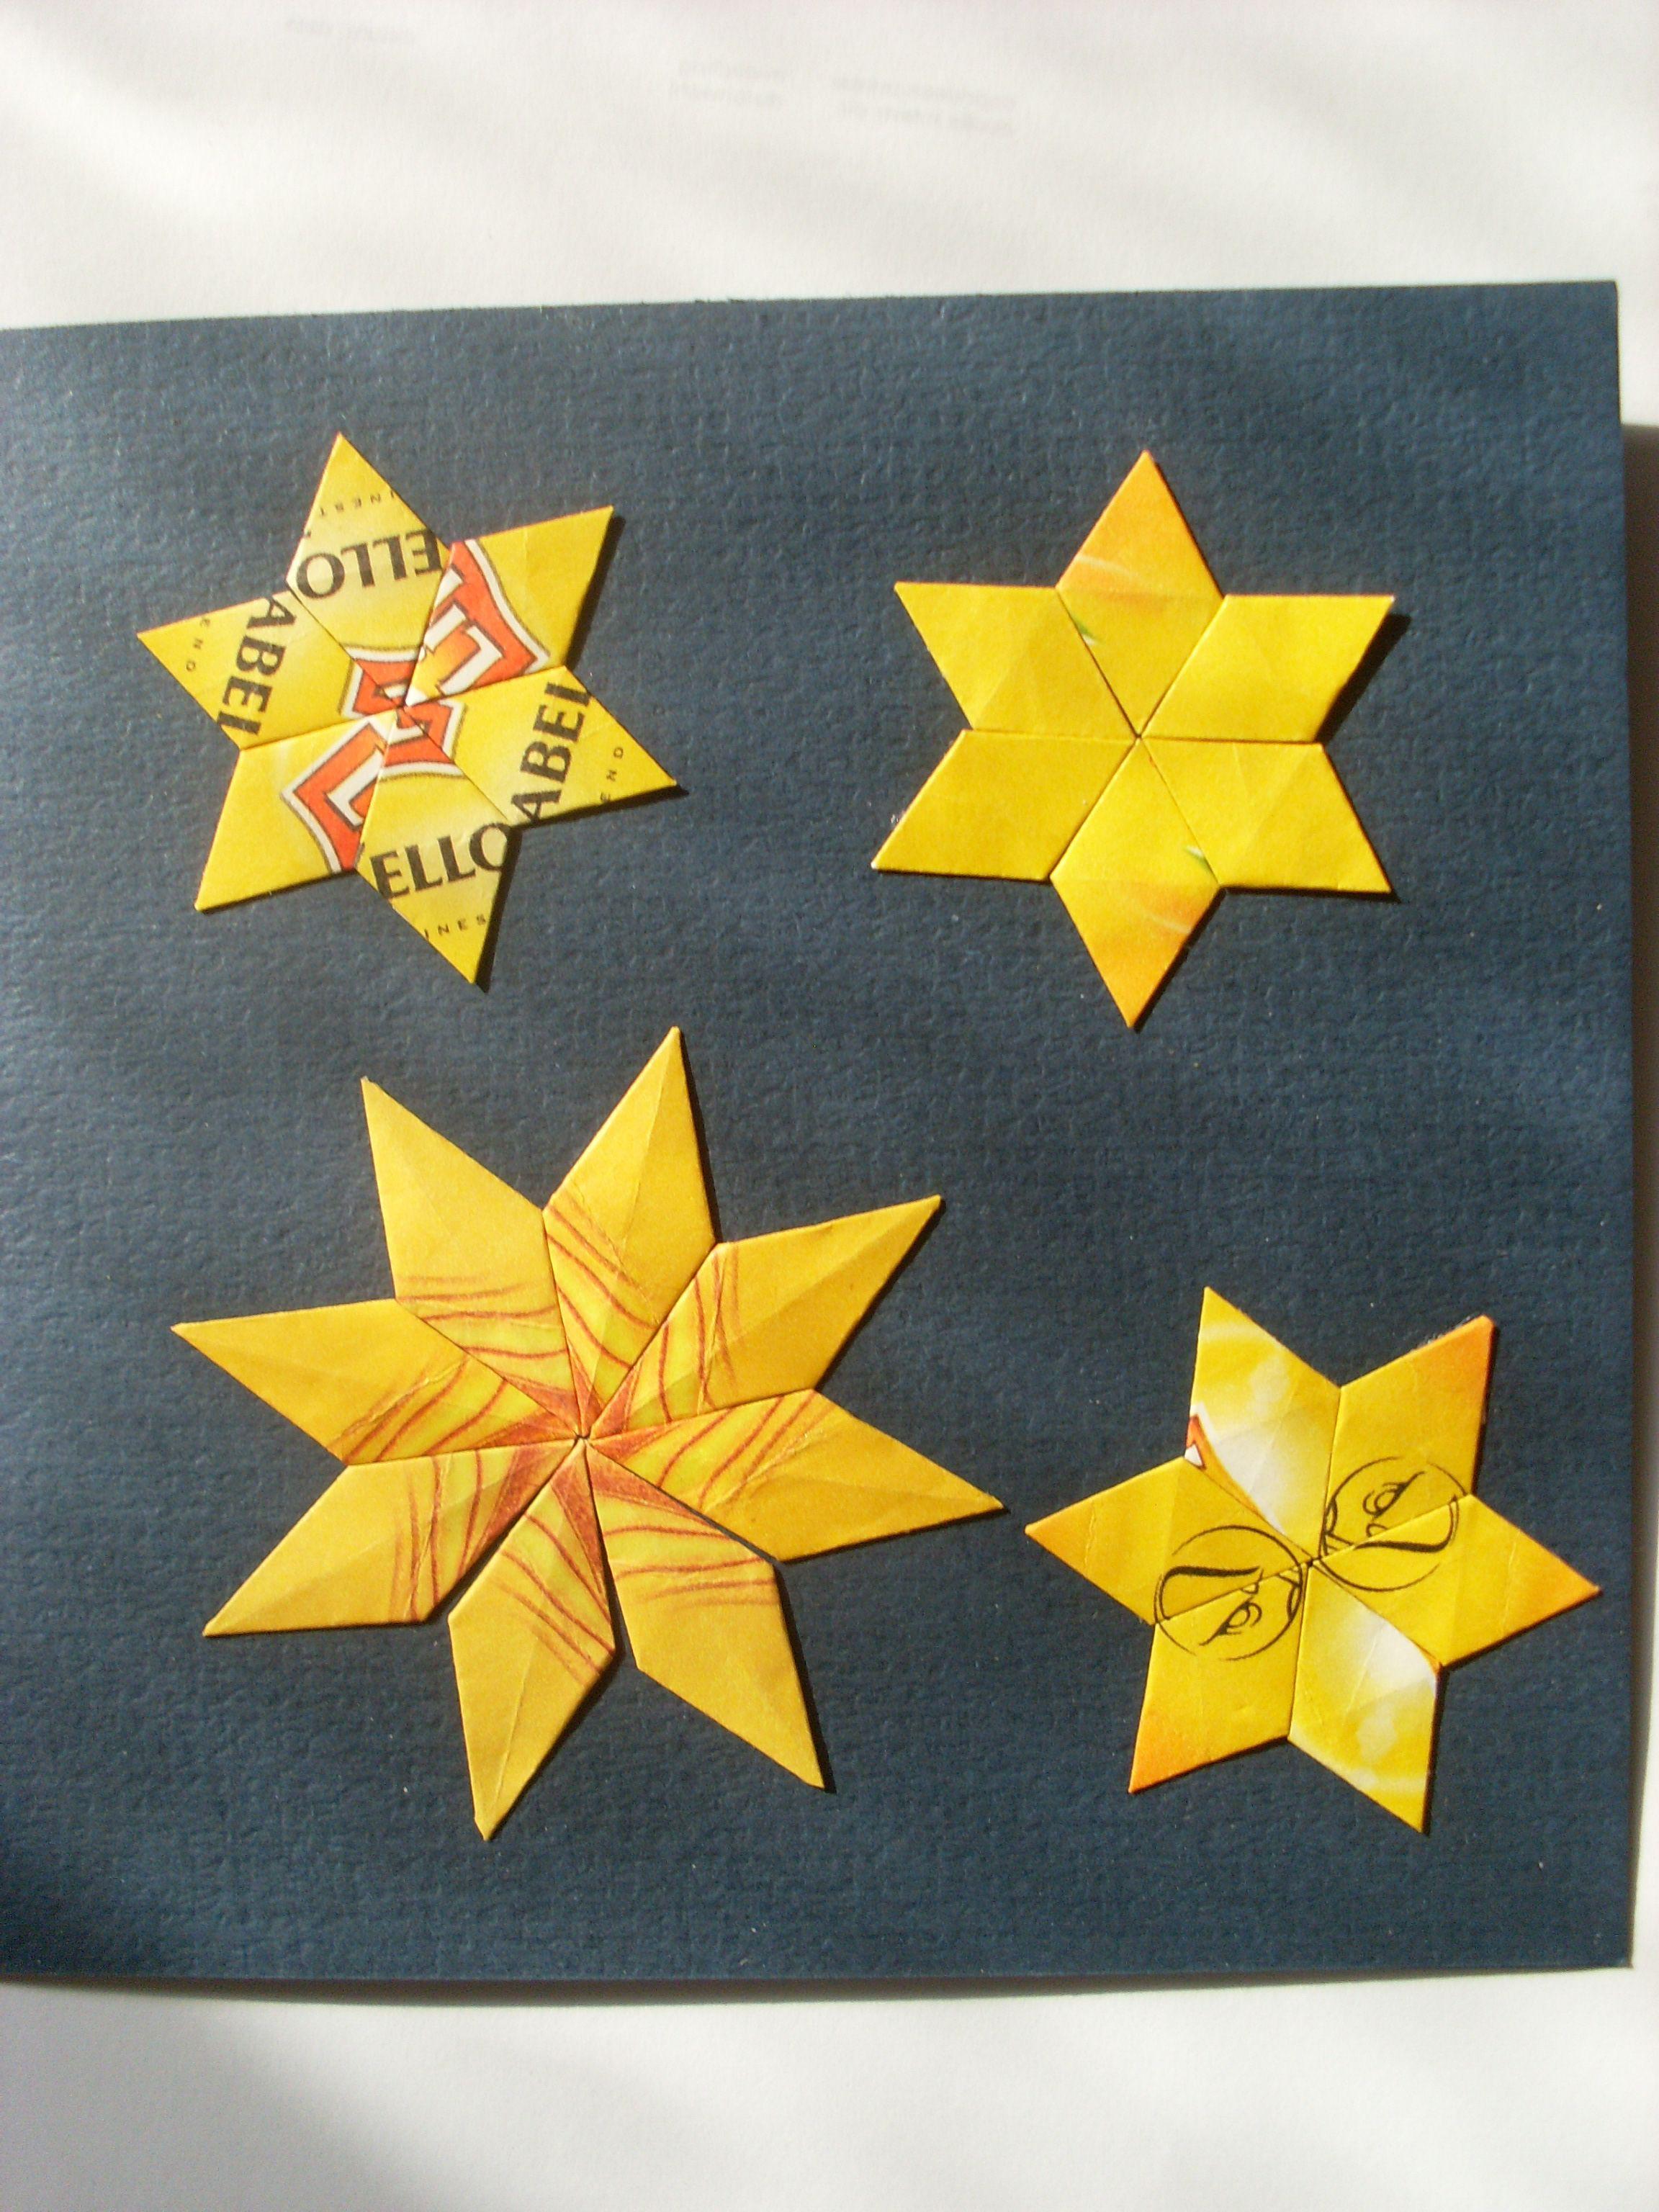 Christmas card stars teabag folding origami Kerstkaart sterren